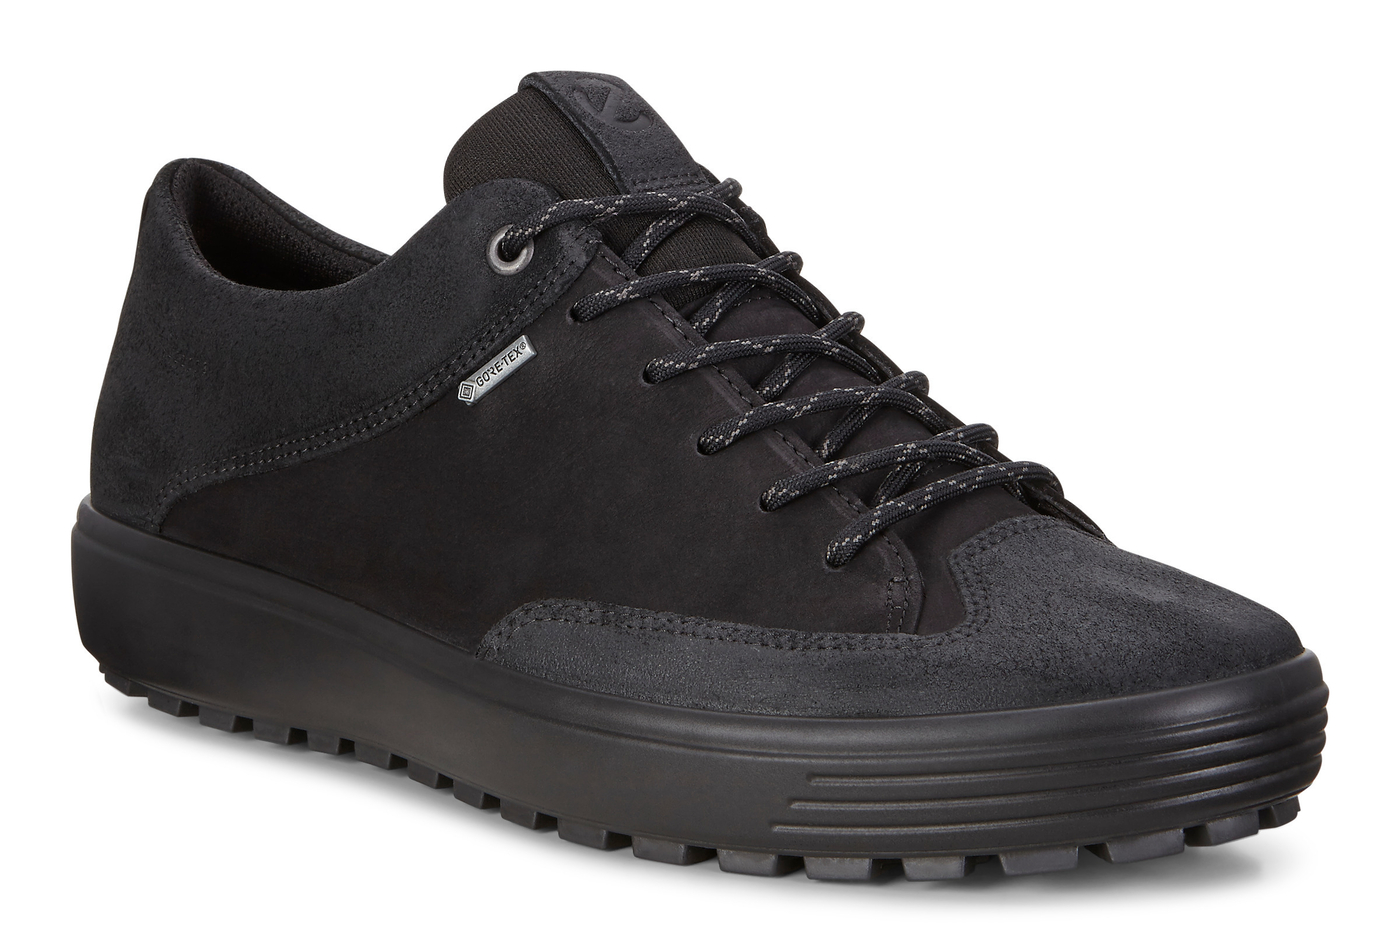 ECCO SOFT7 TRED Mens Sneaker GTX Lace